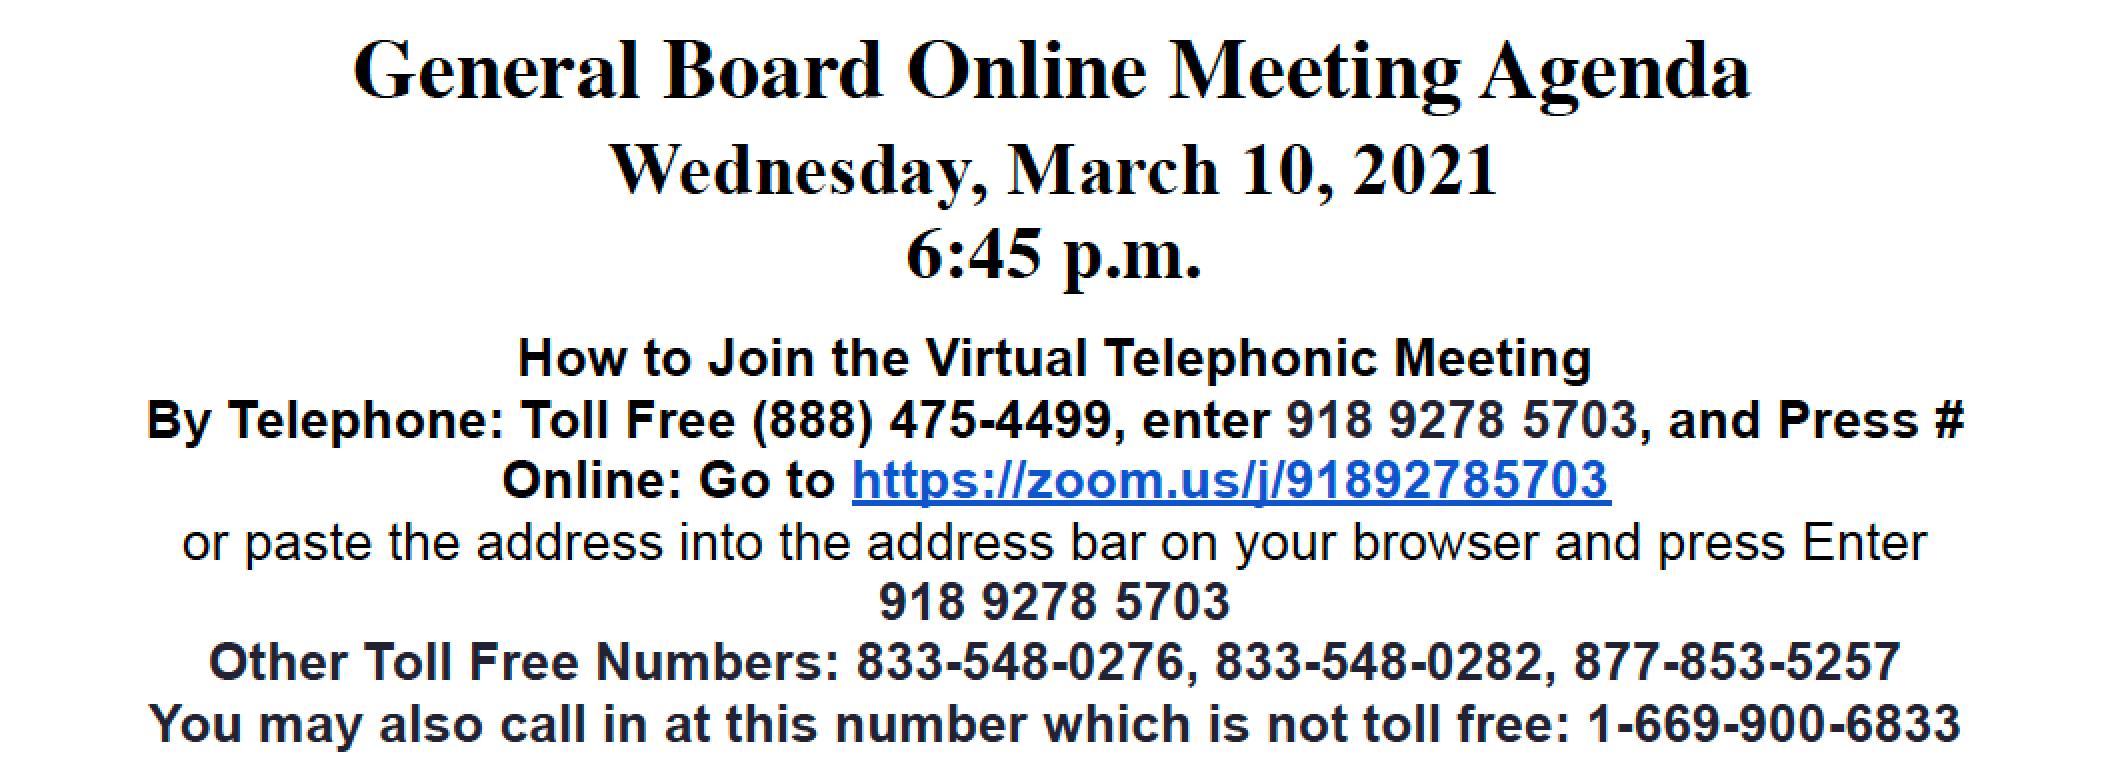 General Board Online Meeting Agenda